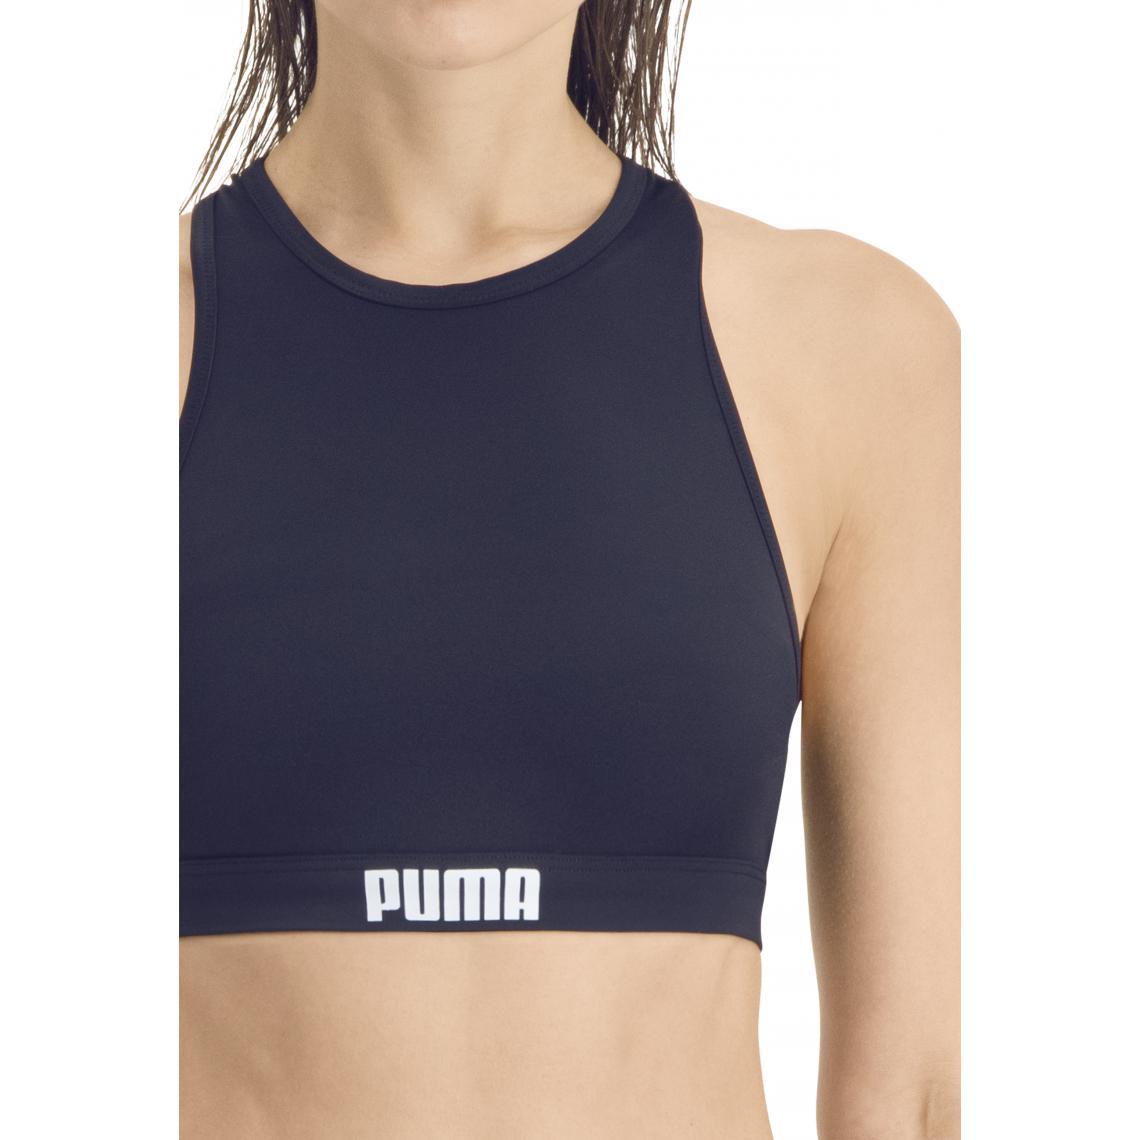 Haut de Maillot de Bain brassière Bleu Puma - Puma femme - Modalova